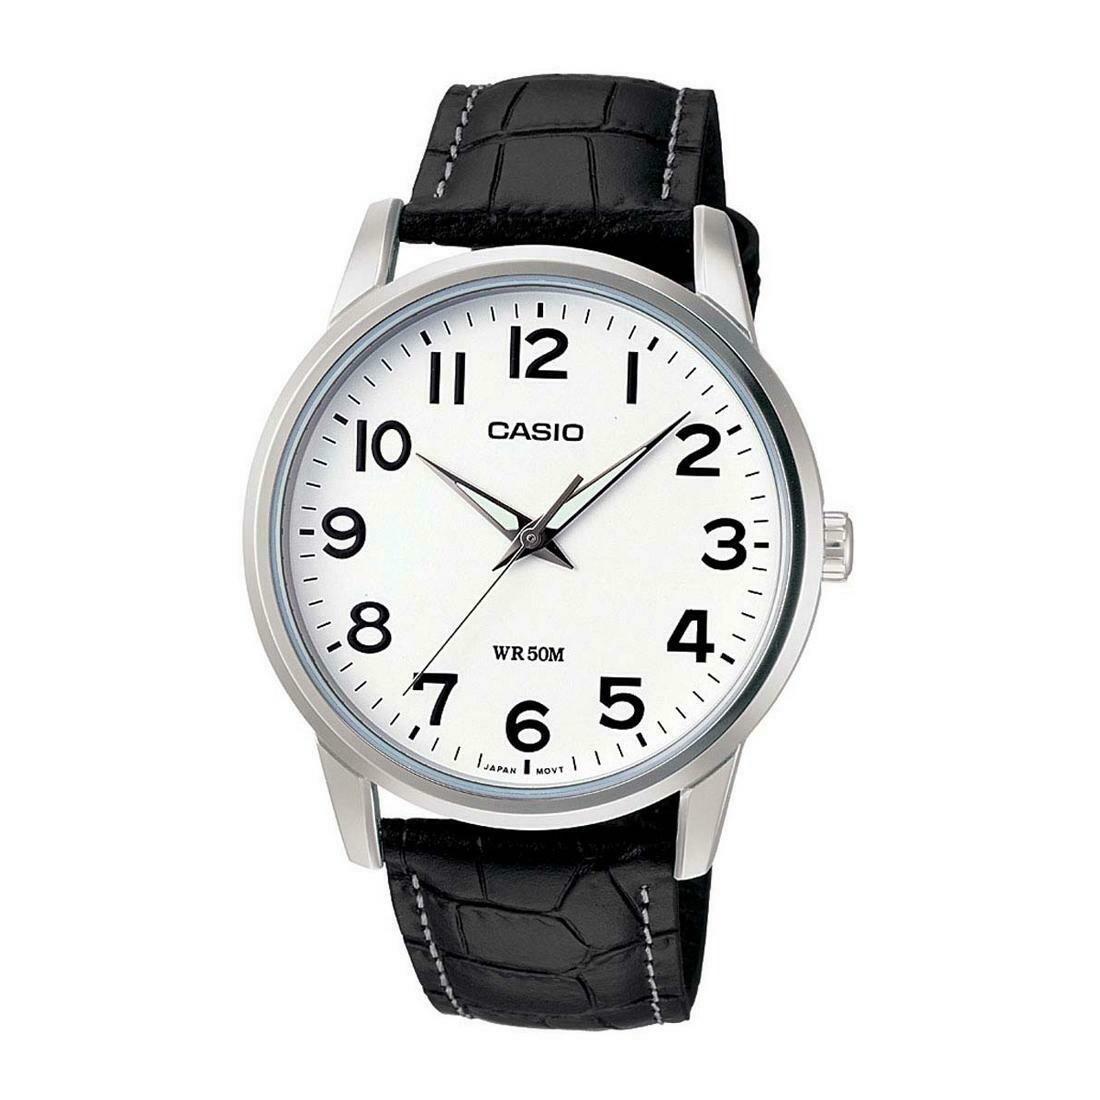 Casio Enticer MTP-1303L-7BVDF Analog Wrist Watch For Men - Black